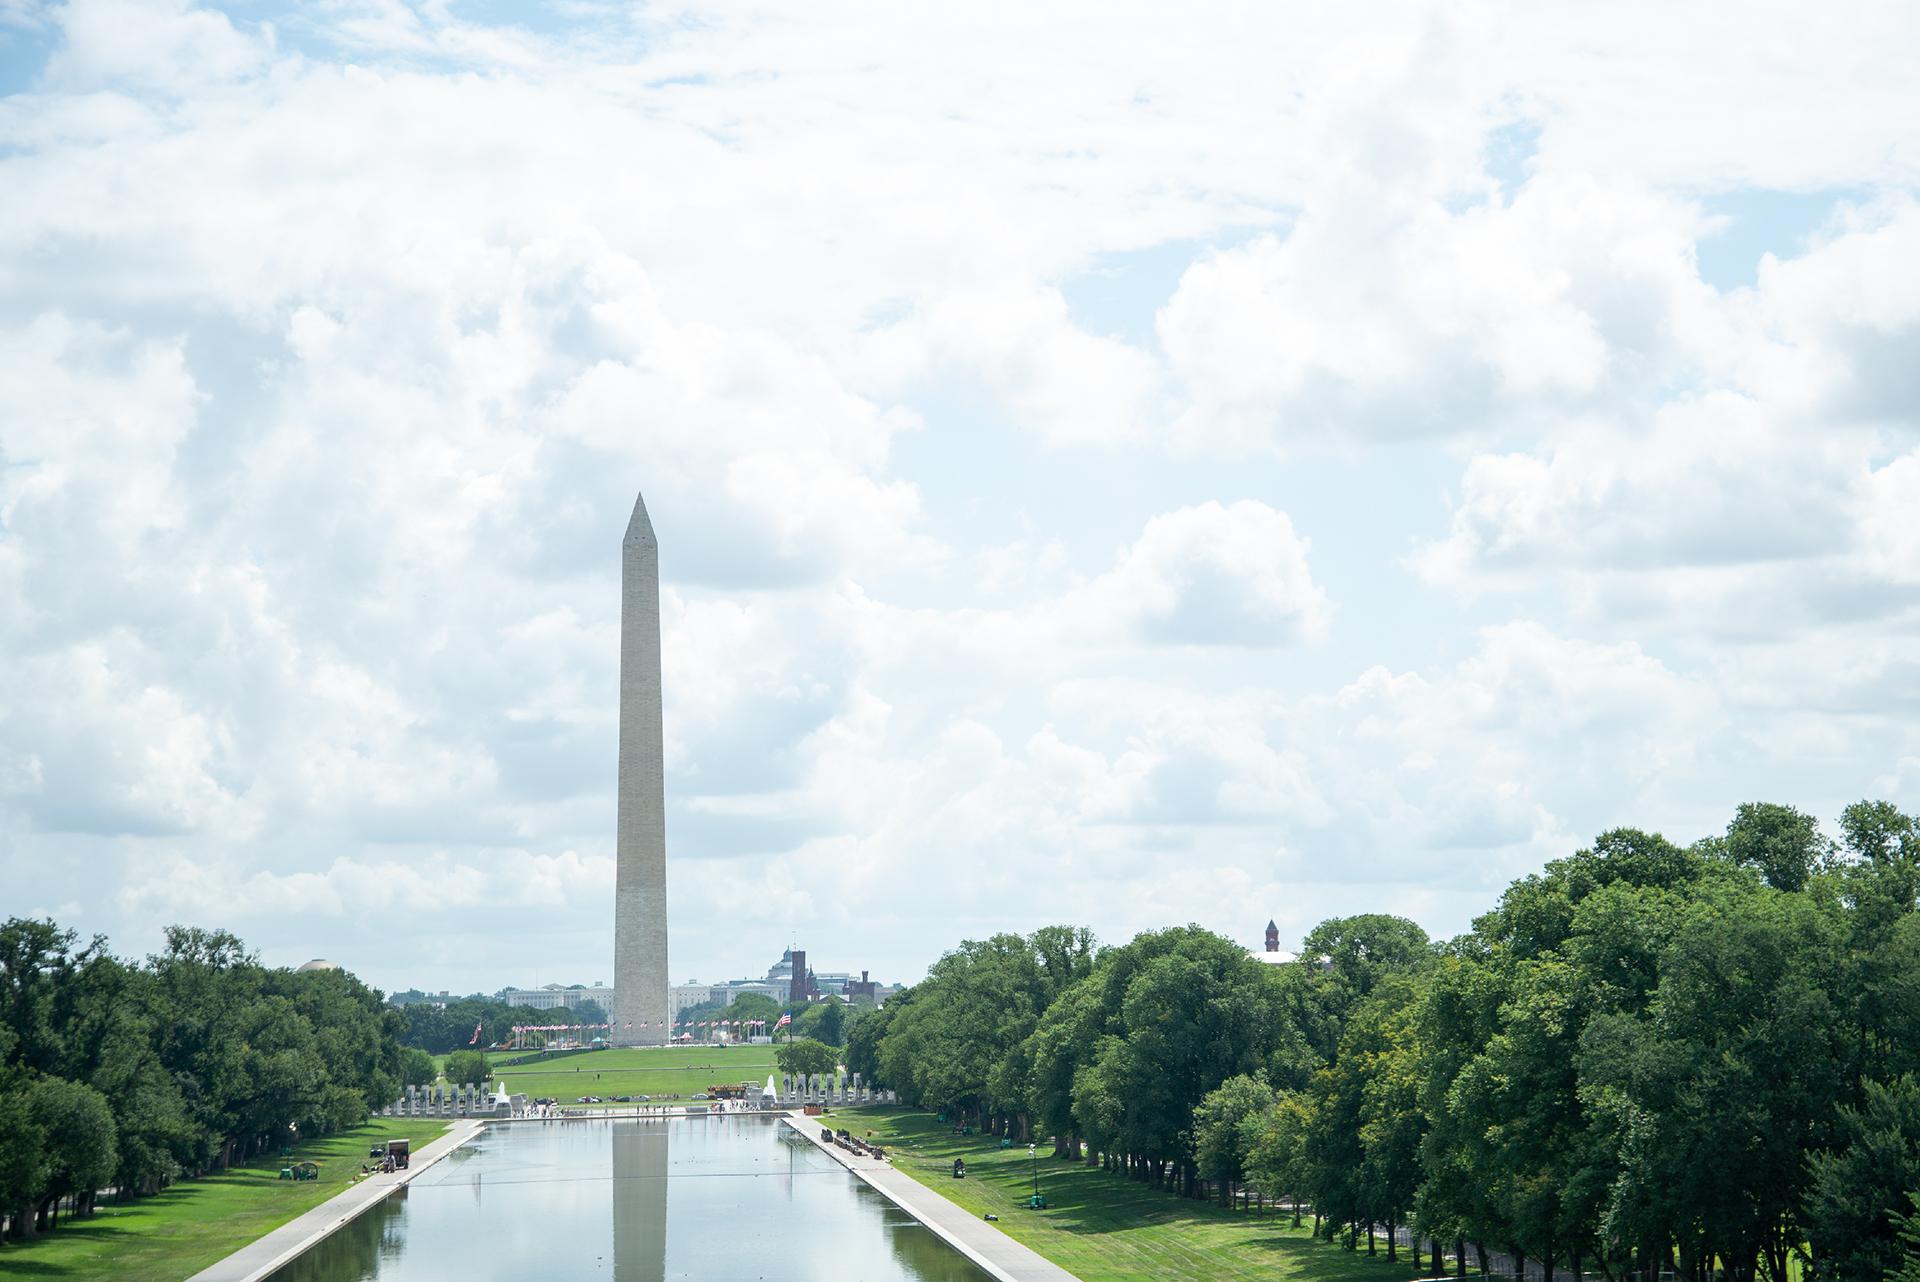 4 of July Guide to Washington D.C. Washington Monument